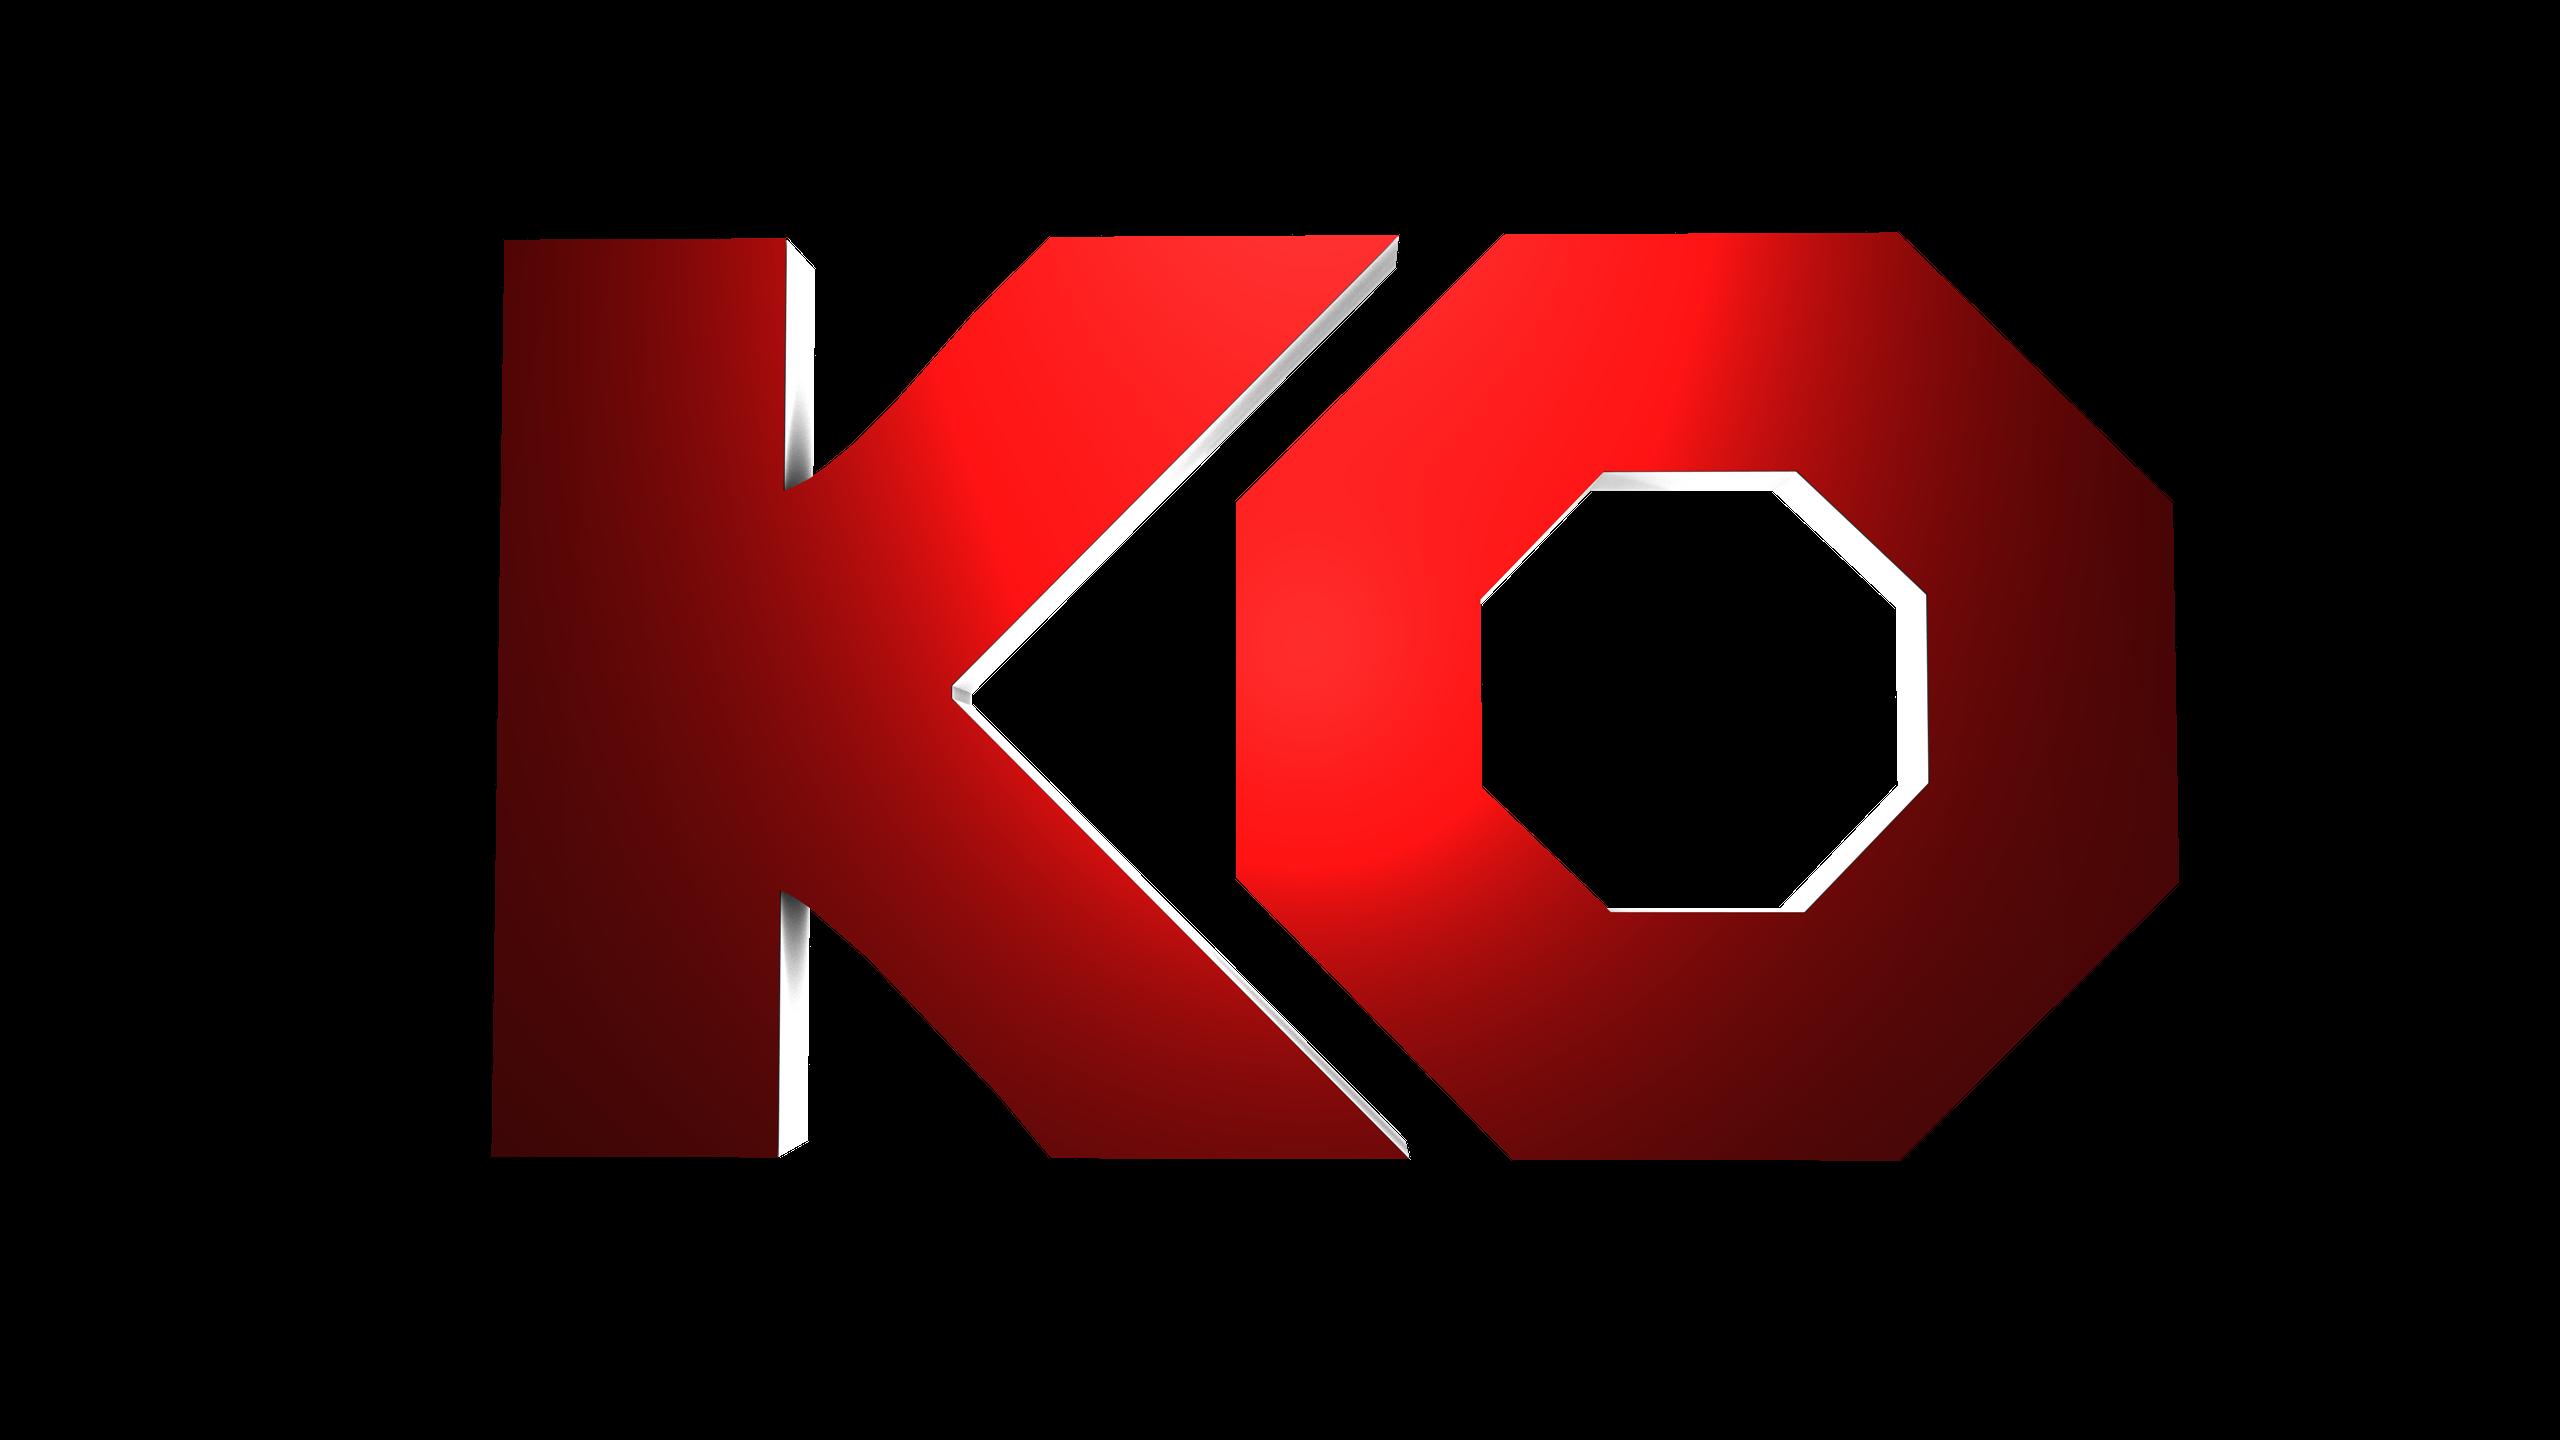 WWE Kevin Owens Logo 2016 by LastBreathGFX on DeviantArt